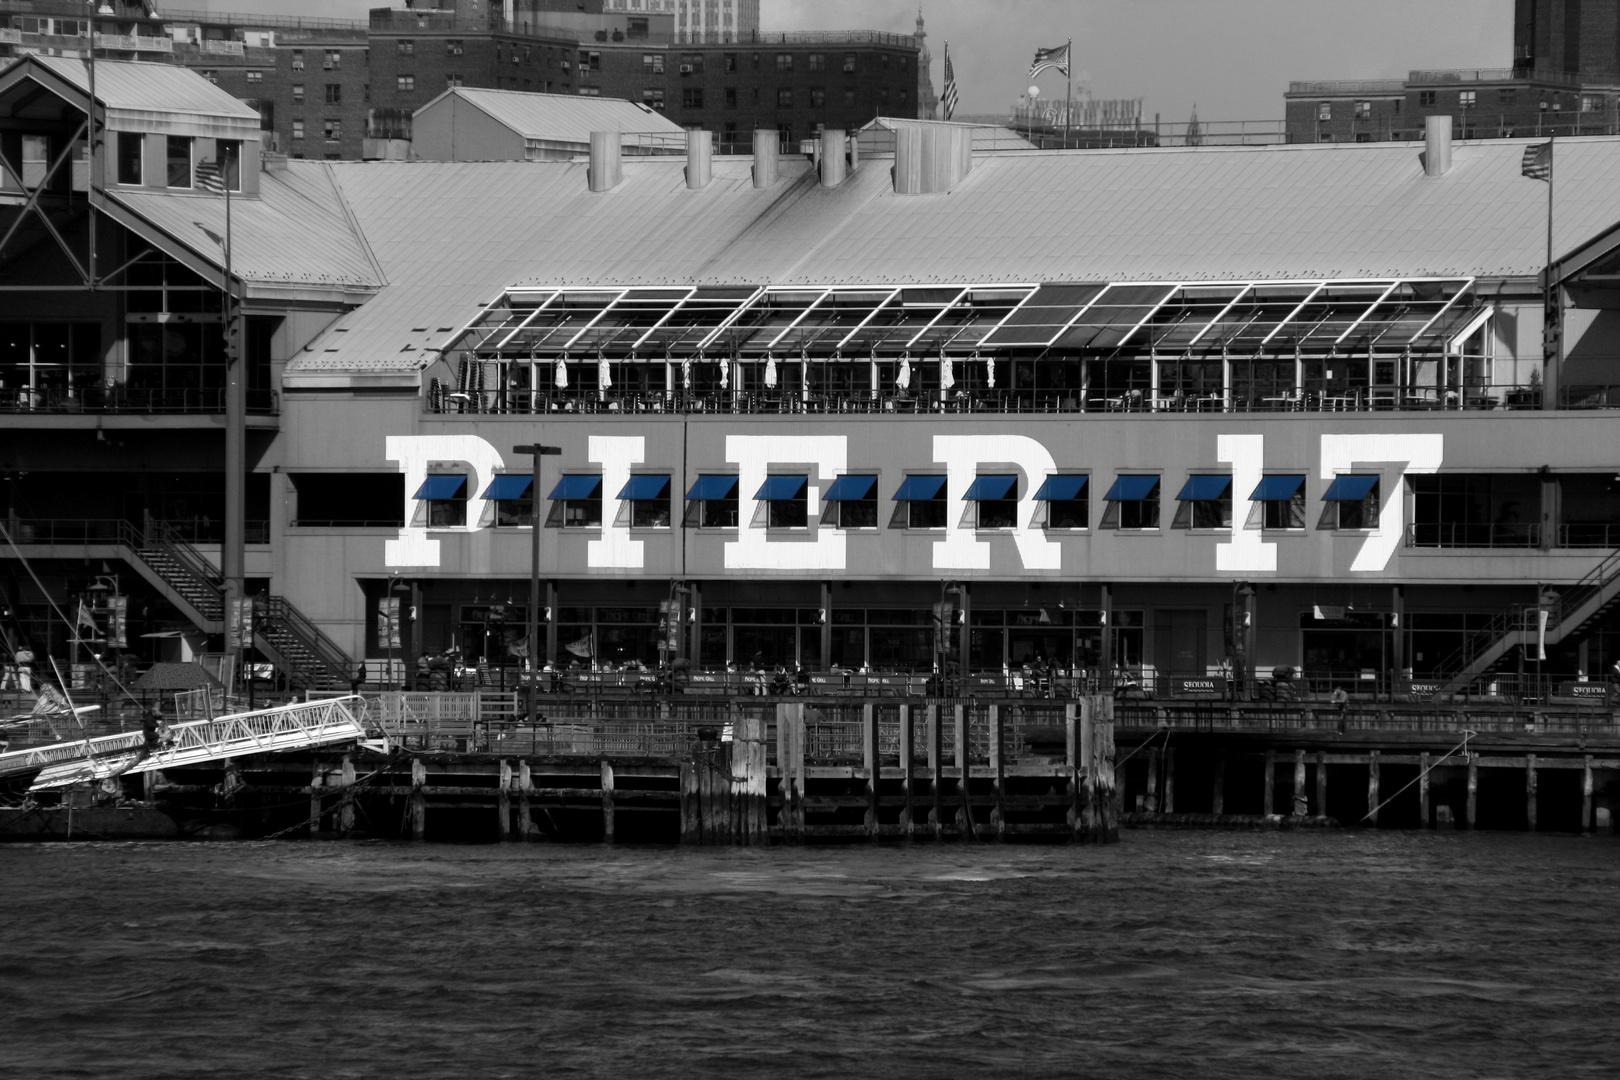 Pier 17 - New York